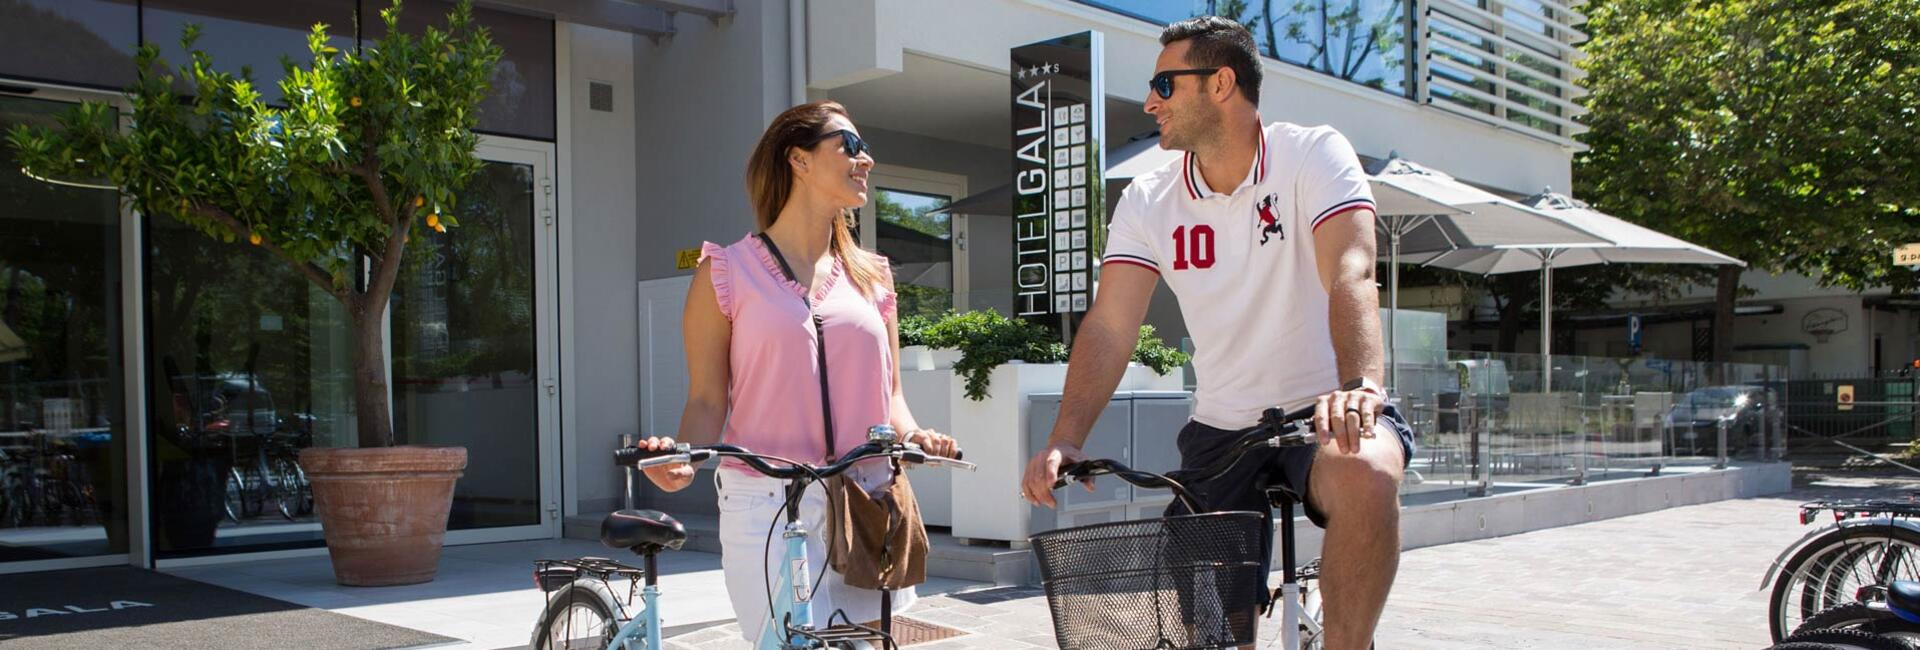 hotelgalamisano it bike-hotel 002